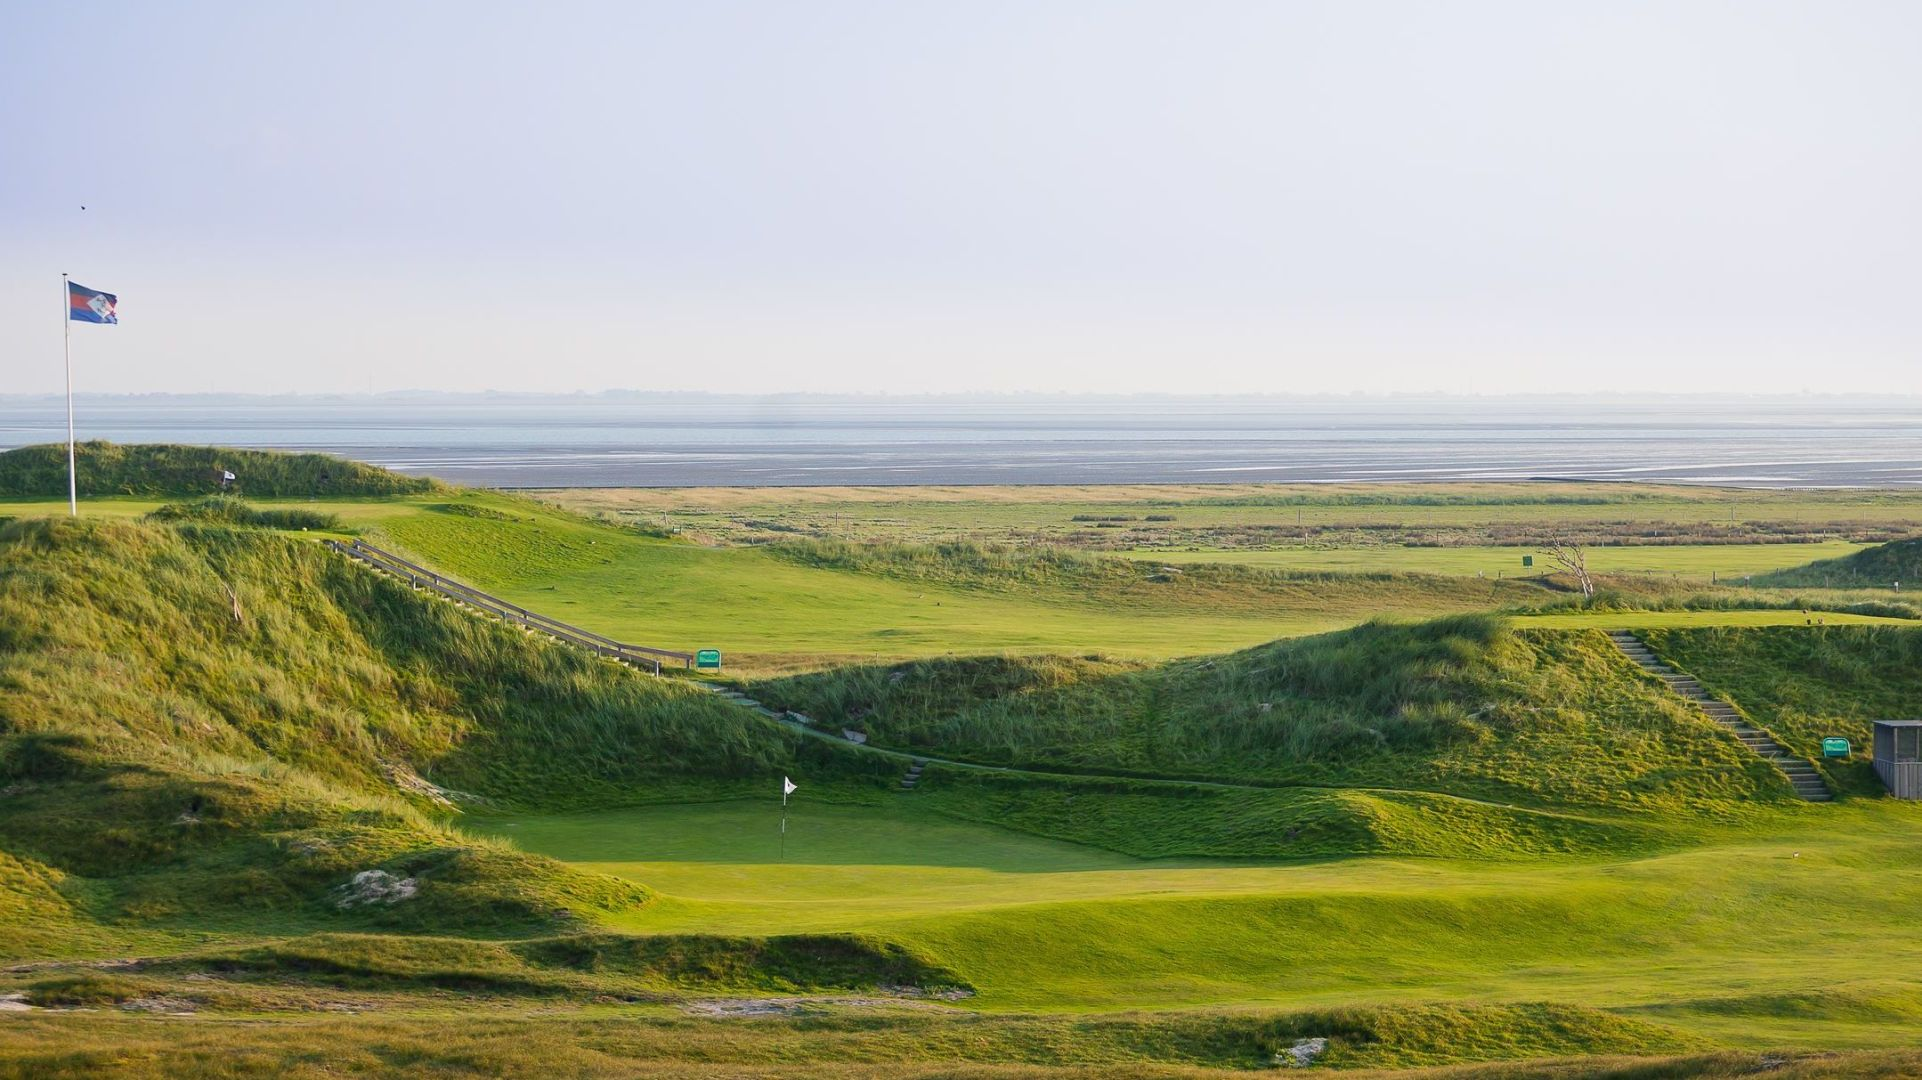 Golfplatz in Norderney